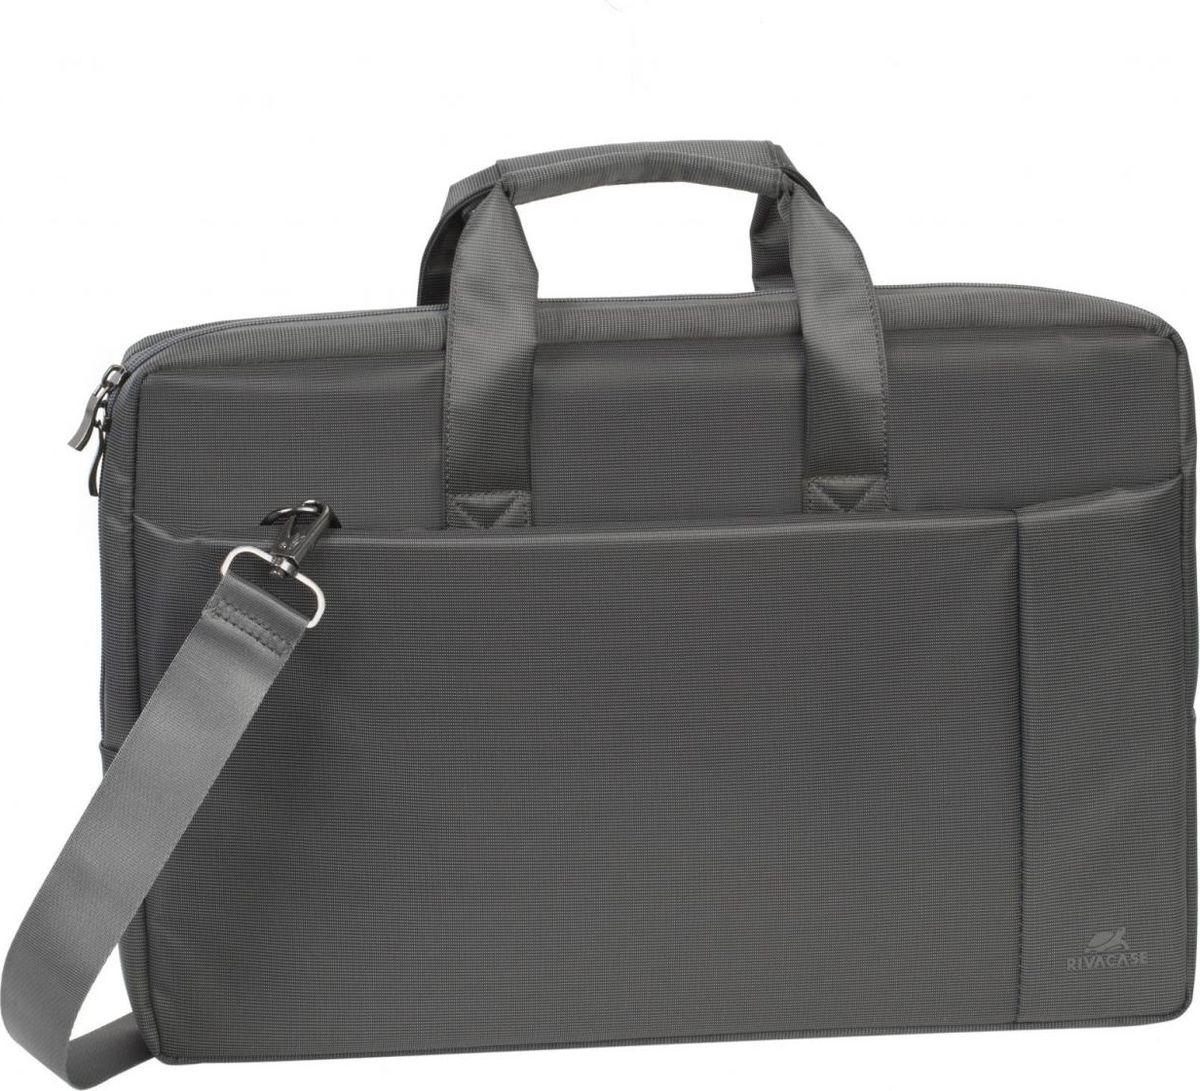 RivaCase 8251, Grey сумка для ноутбука 17